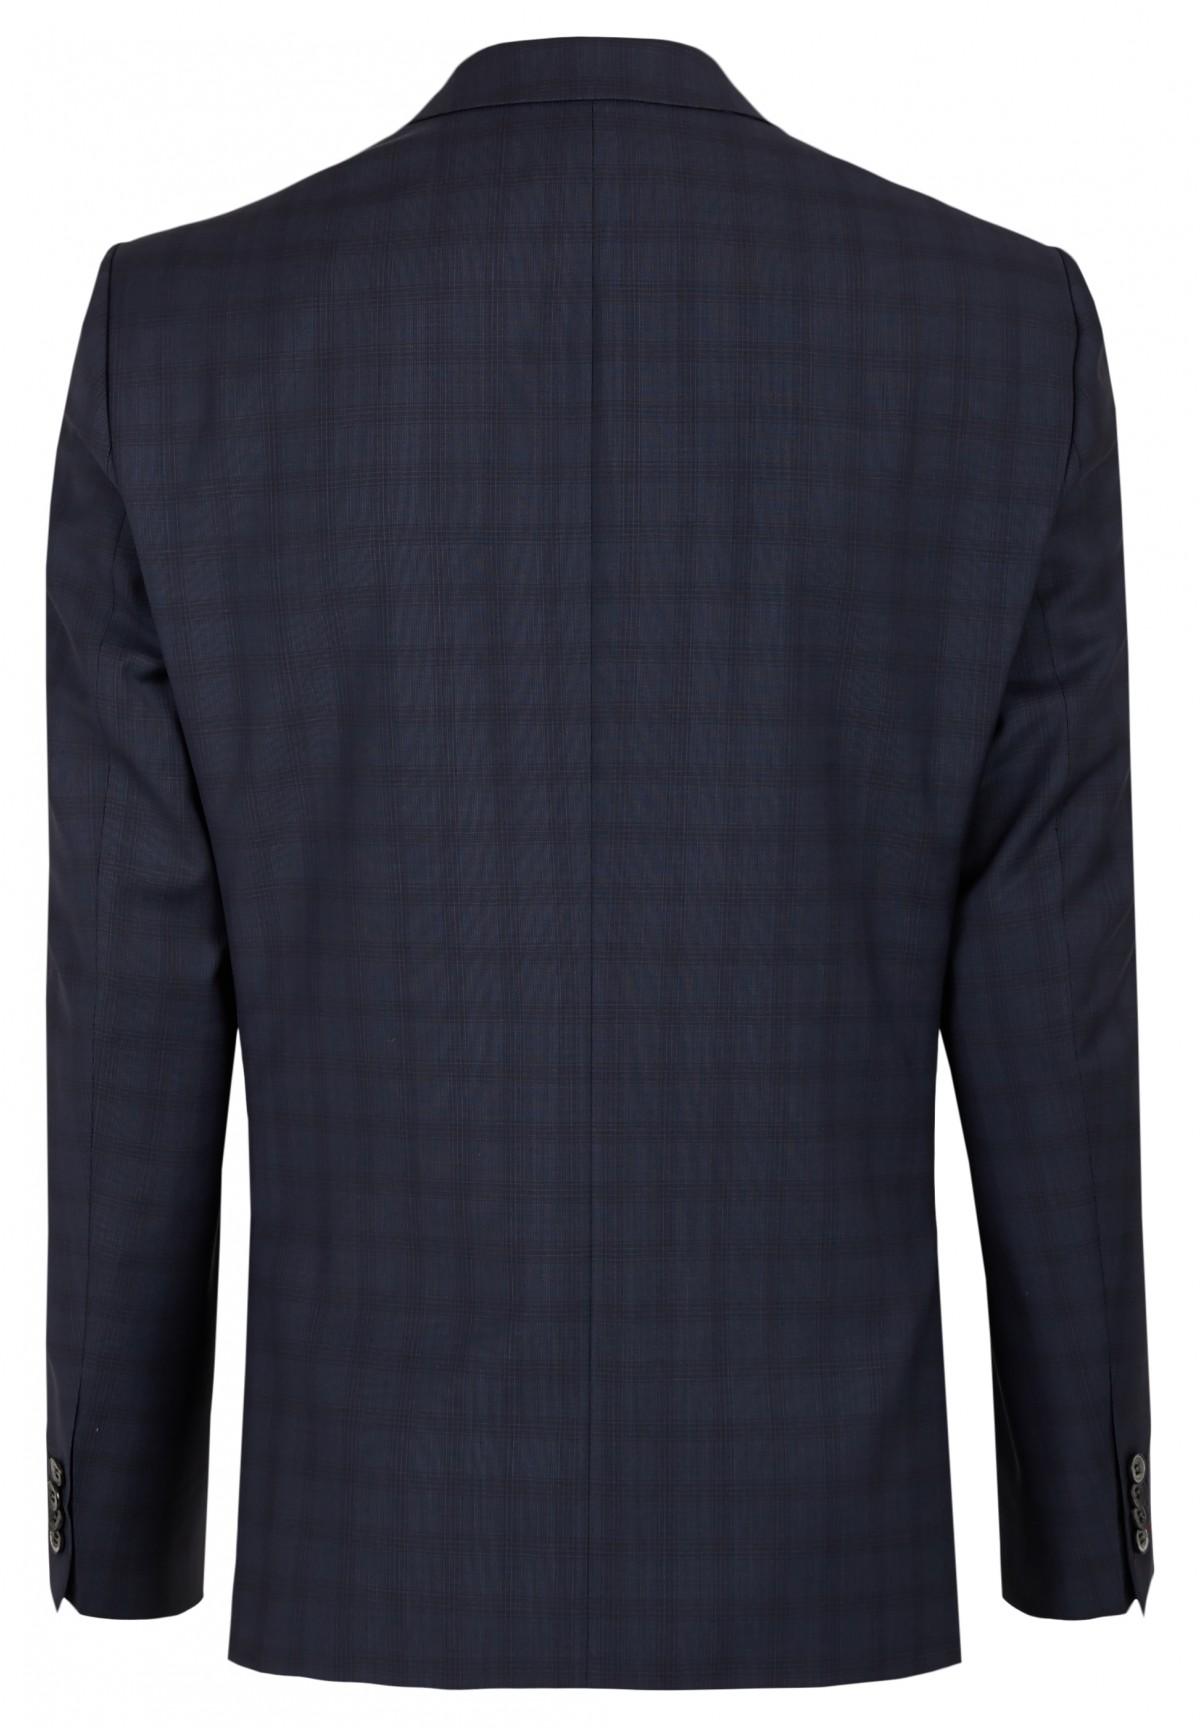 Business-Anzug mit Karo-Musterung / SUIT NEW